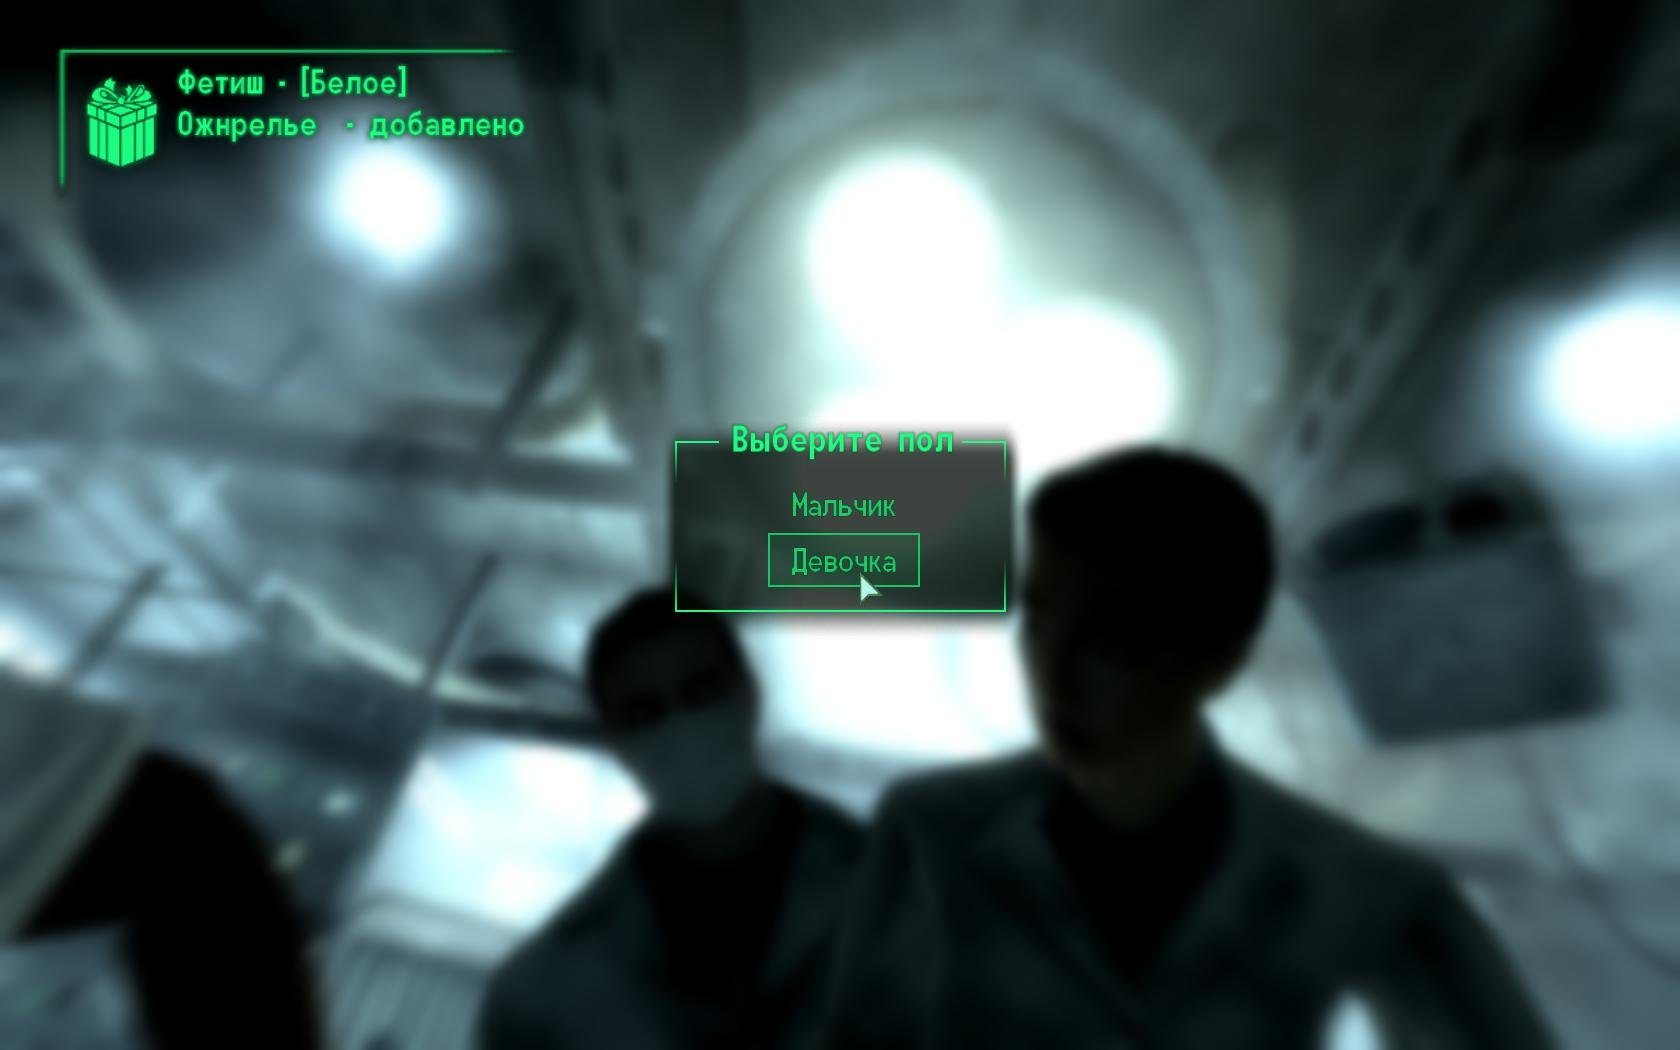 Fallout3 2018-10-01 19-49-51-57.jpg